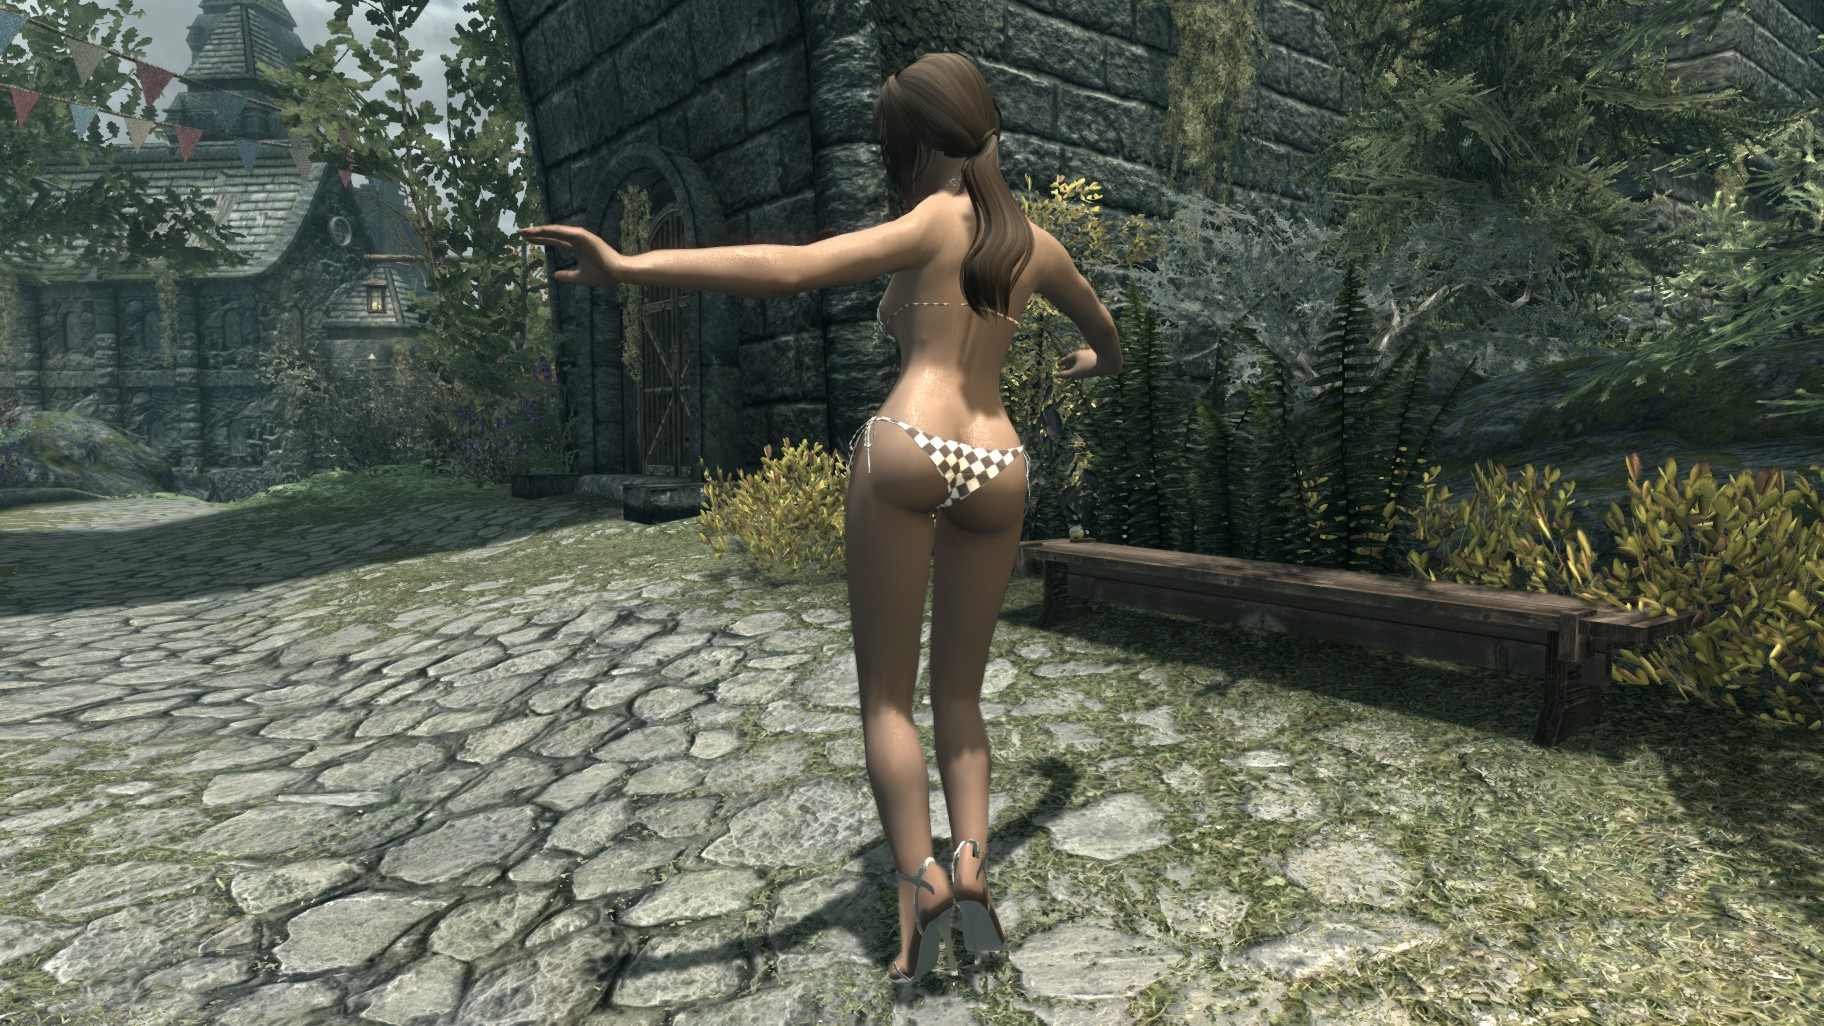 Tits pussy big pics